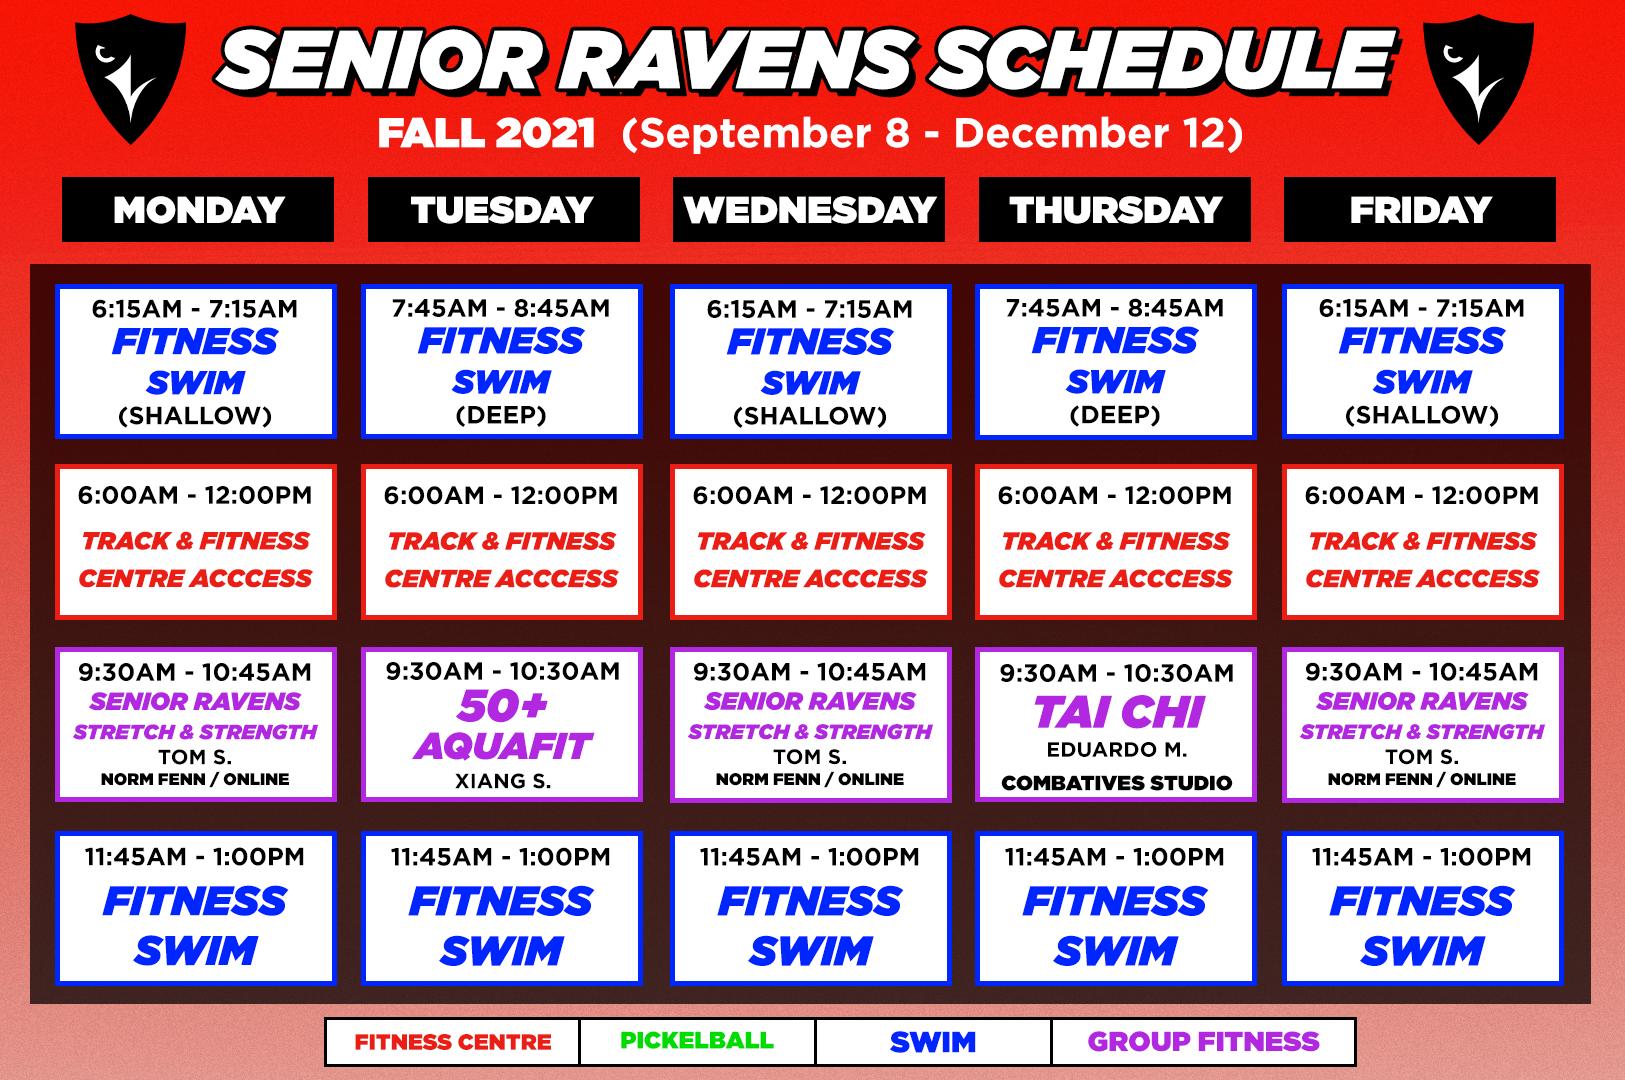 senior ravens fall schedule